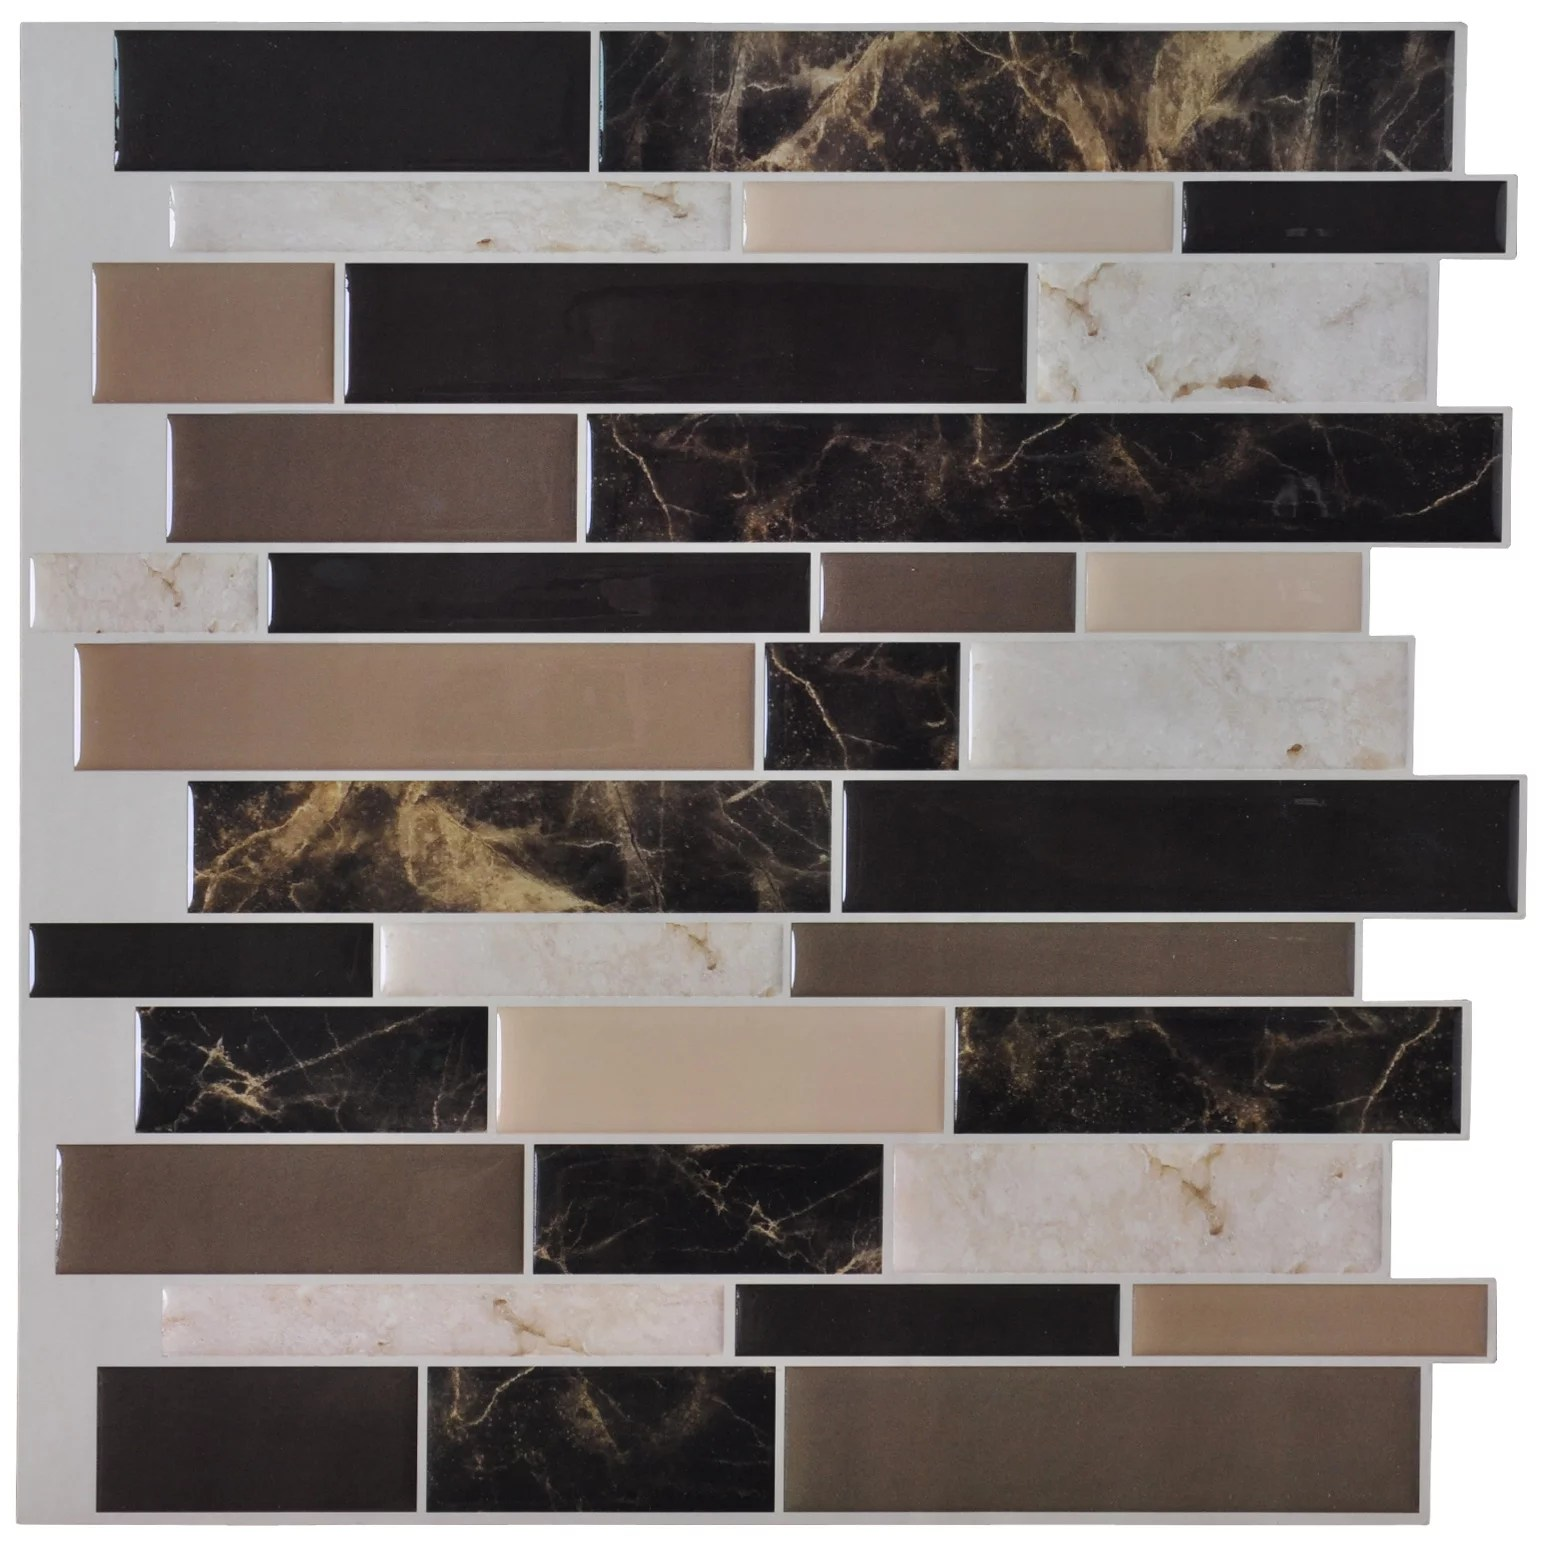 self adhesive wall tile peel and stick backsplash for kitchen 12 x12 6 sheets walmart com